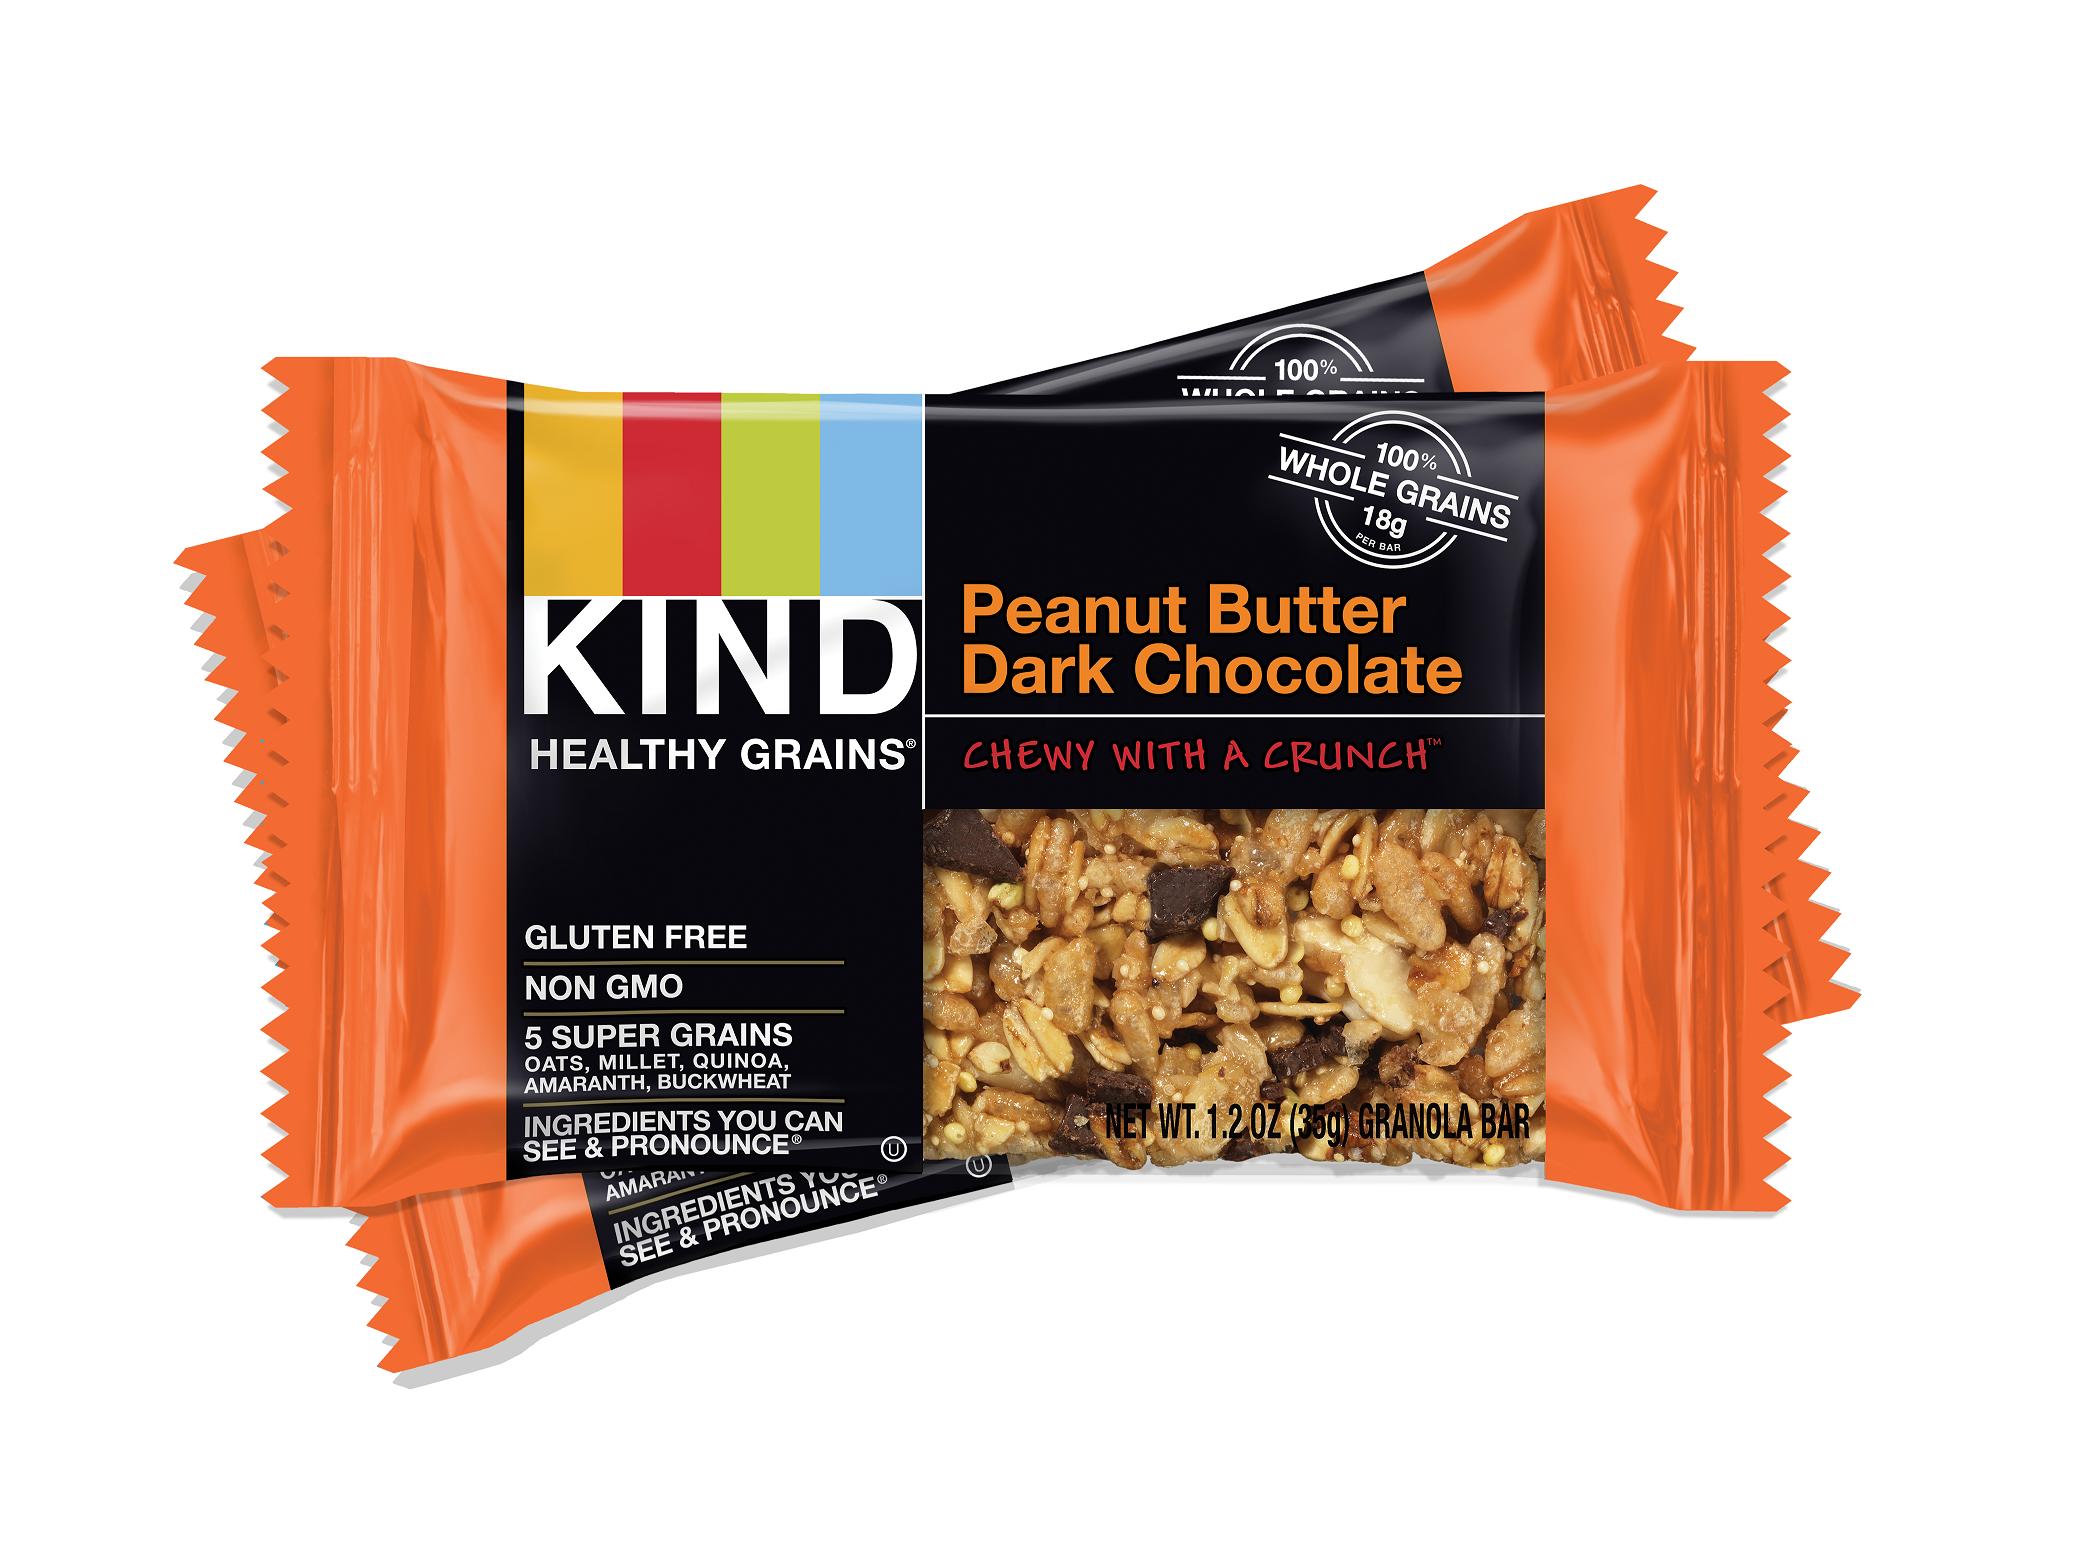 KIND Healthy Grains Bars - Peanut Butter Dark Chocolate - 1.2 oz ...